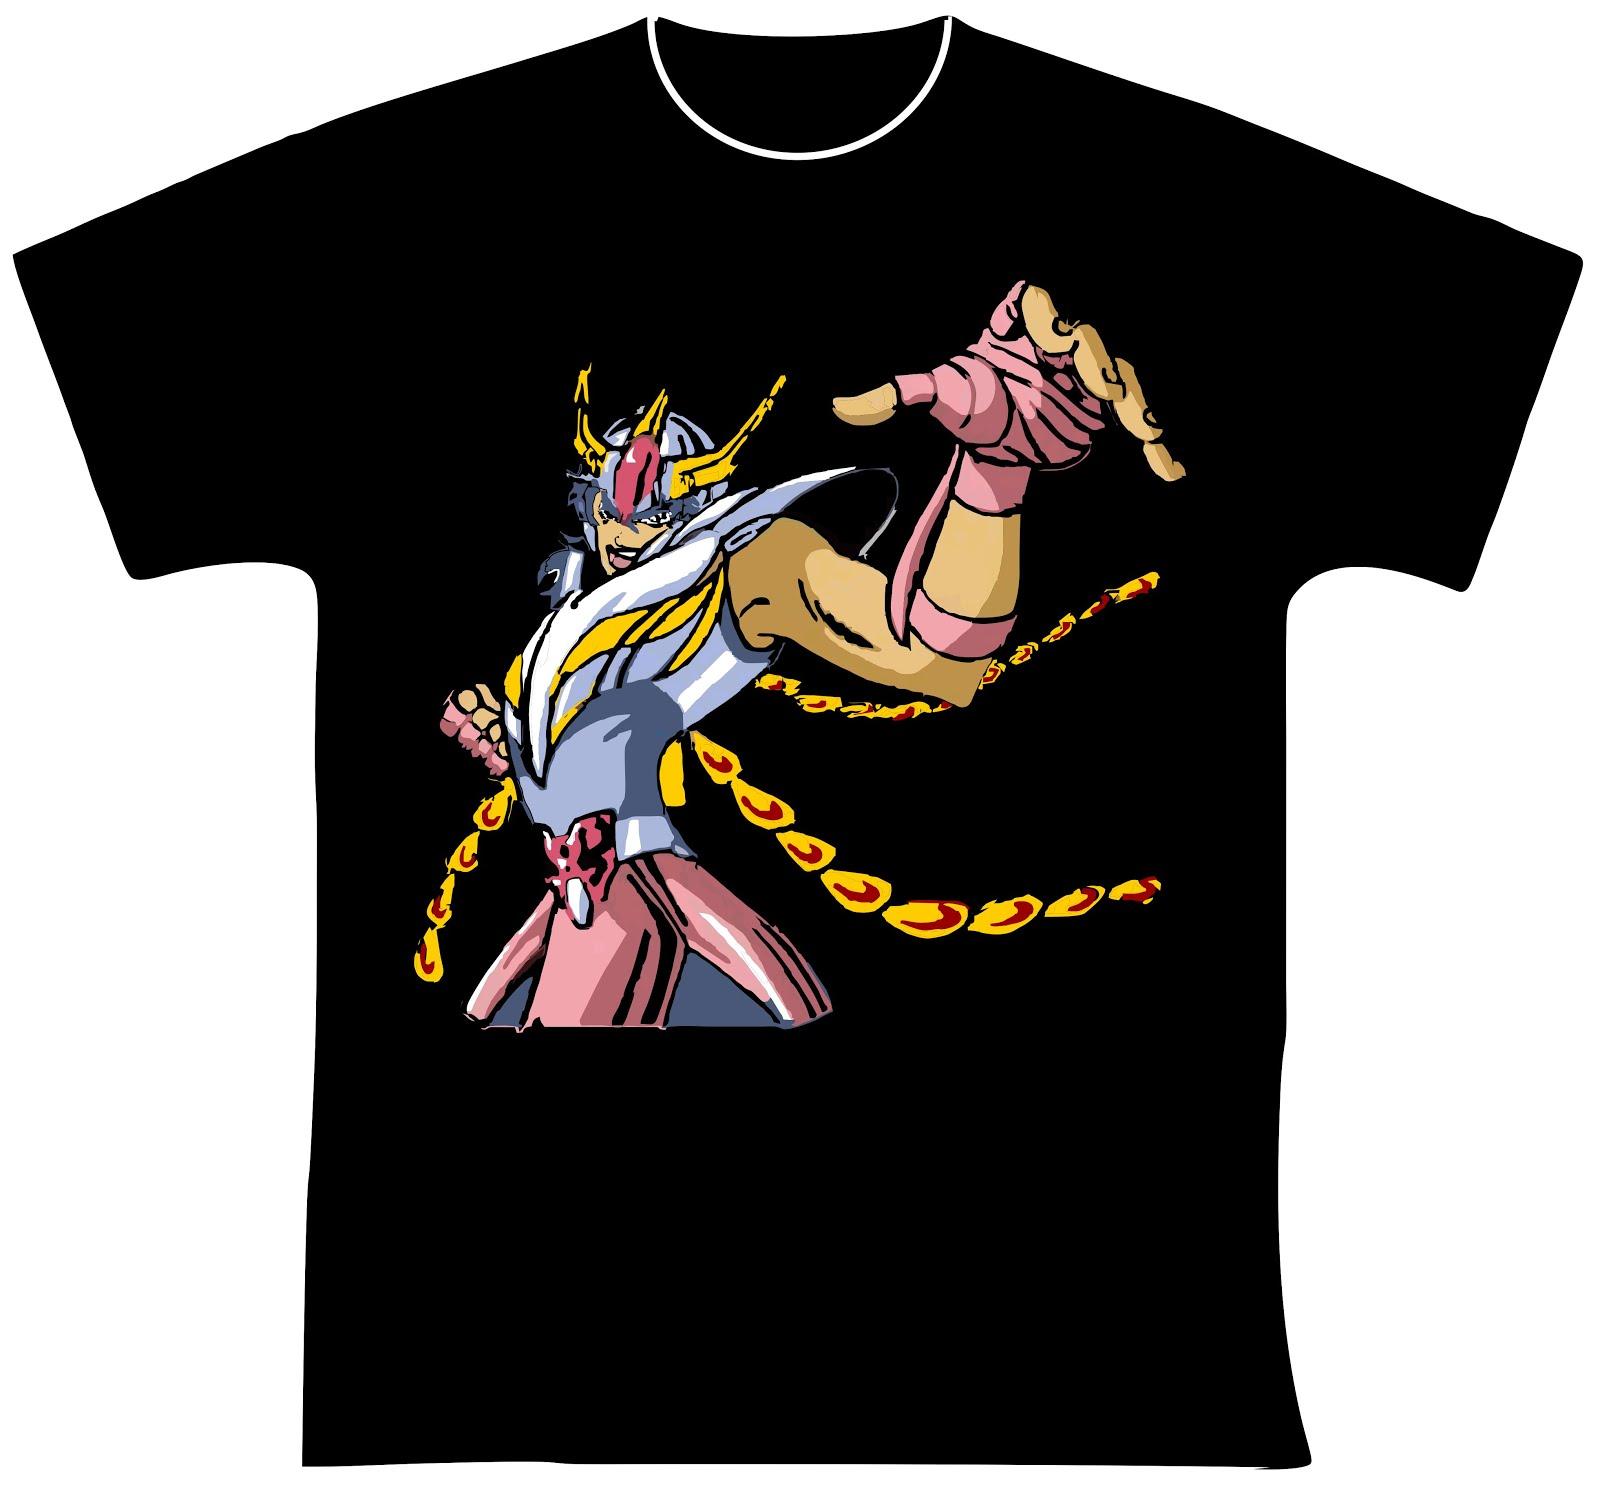 Ikki de fenix (cavaleiros do zodiaco)